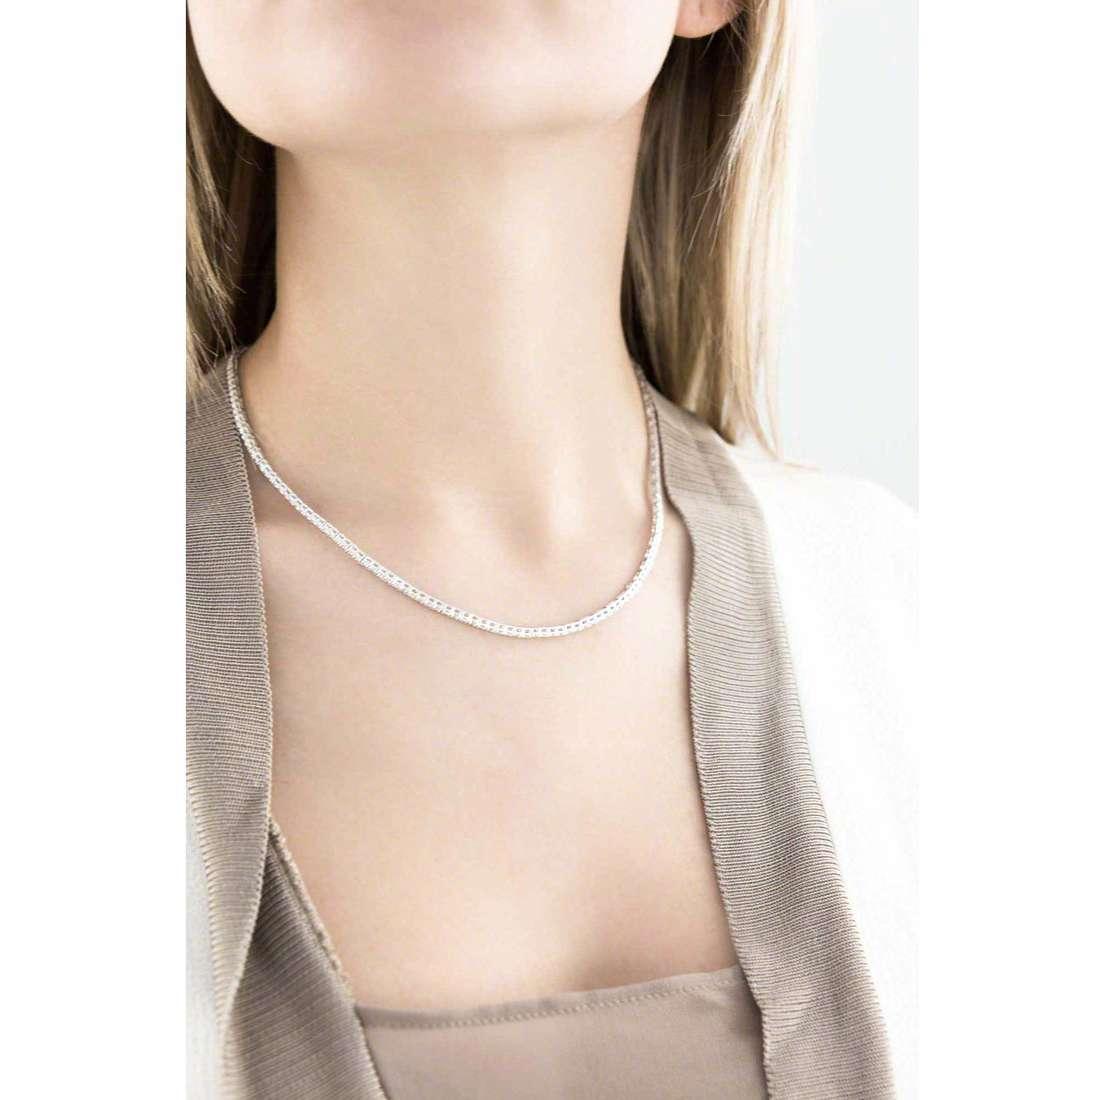 GioiaPura colliers femme 25014-01-45 indosso